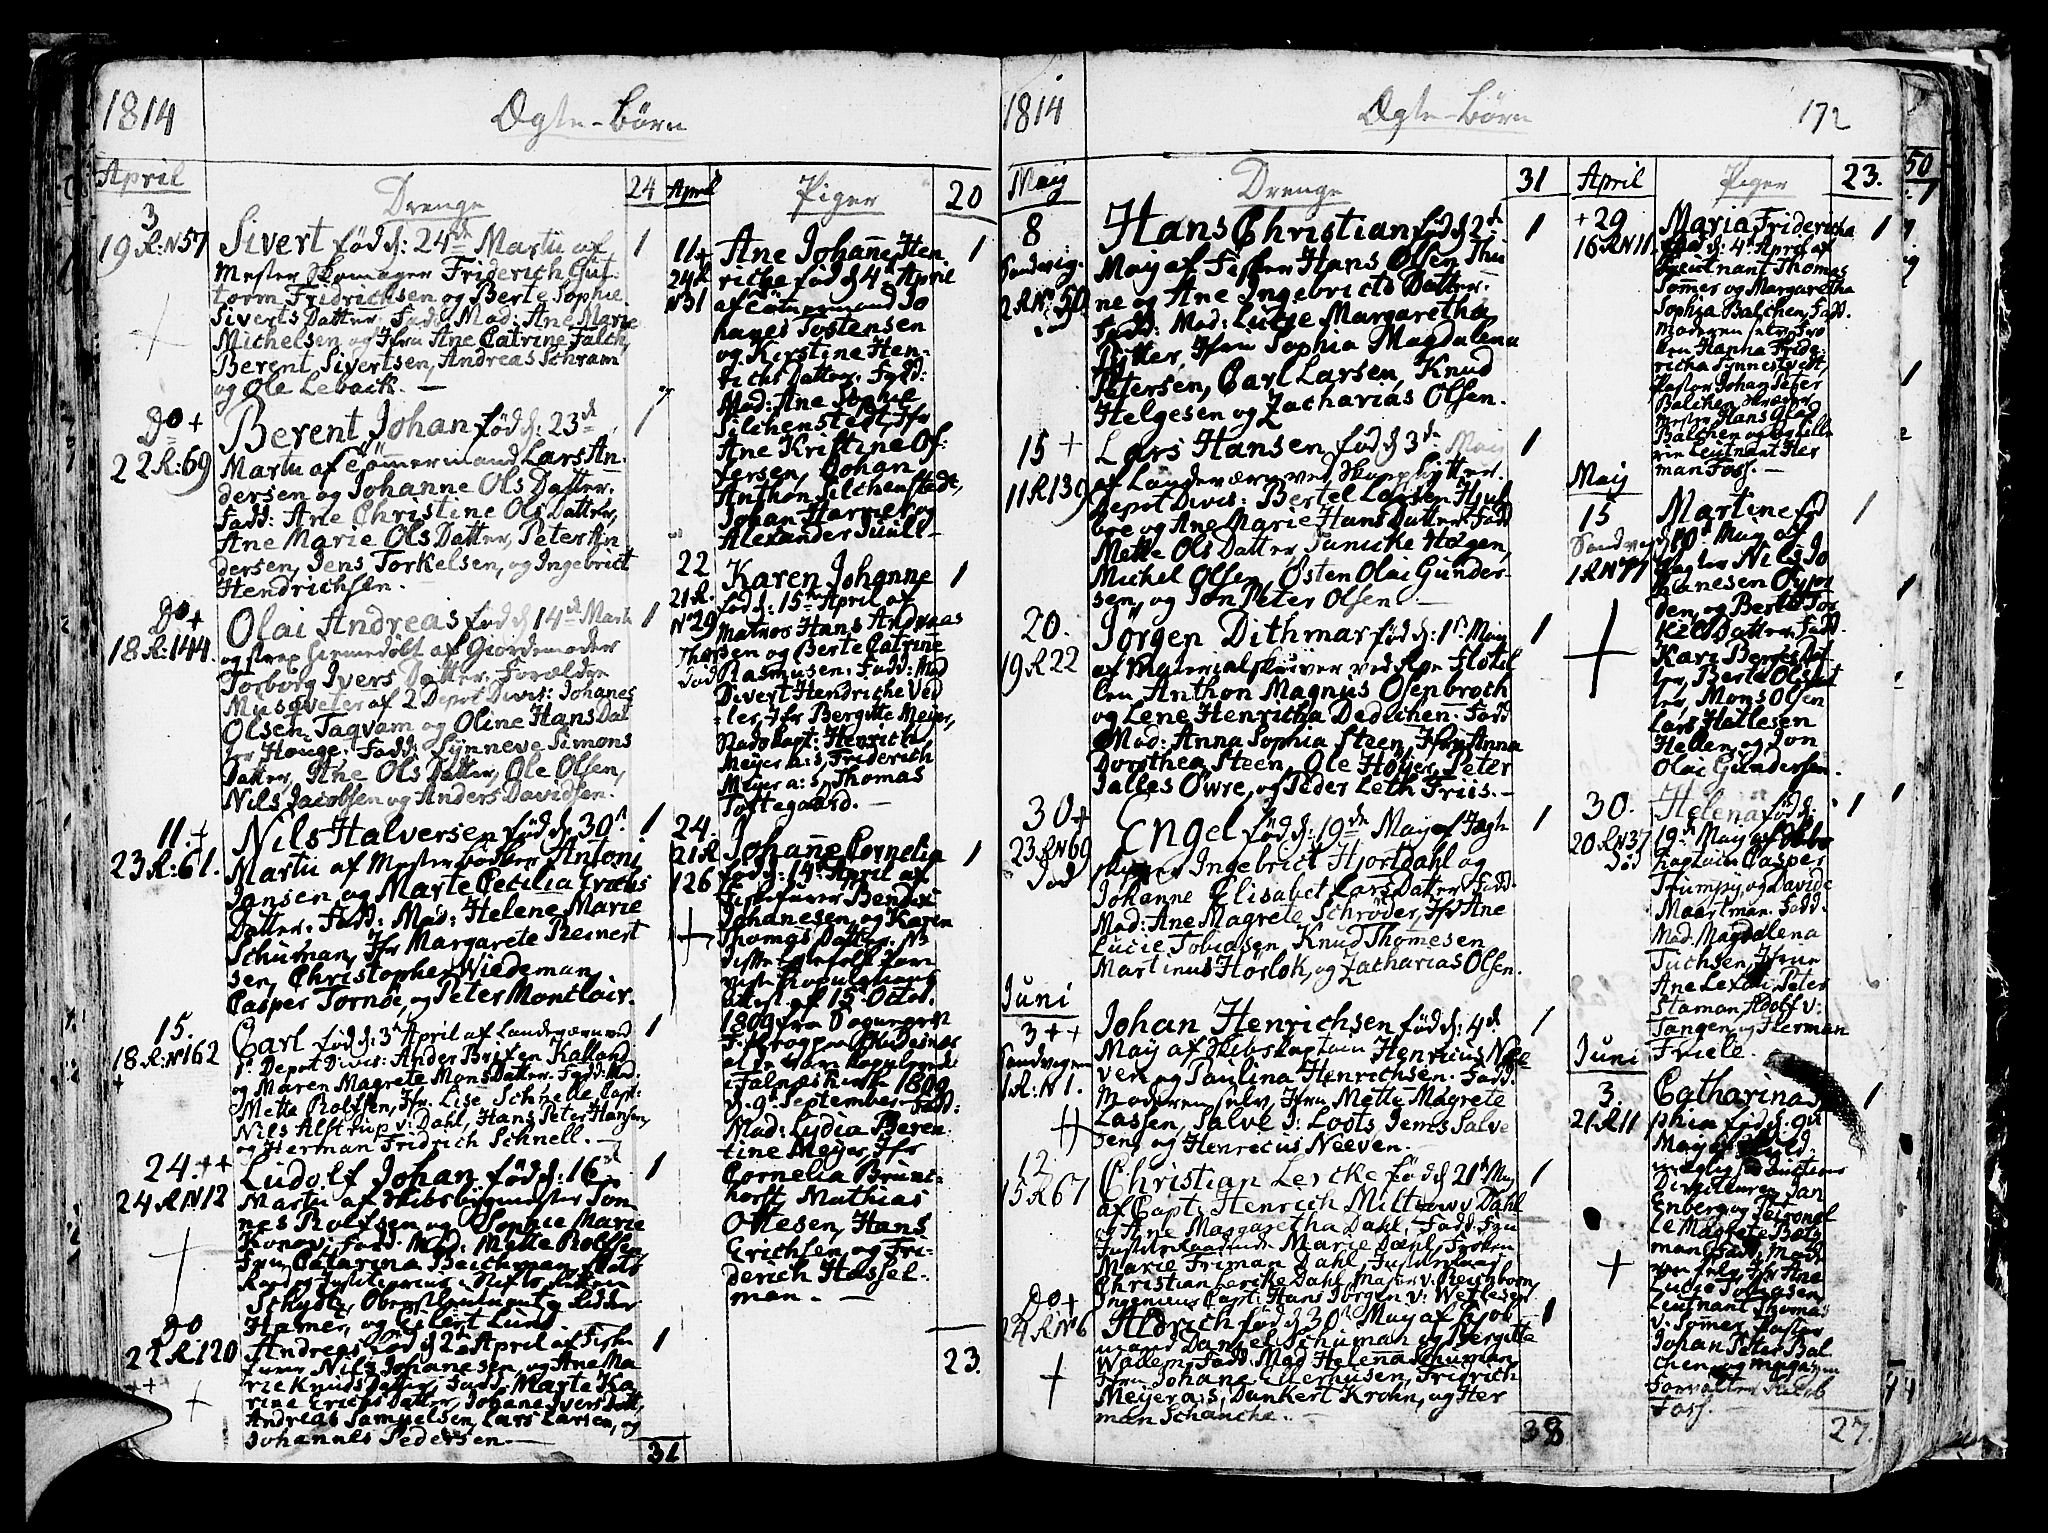 SAB, Korskirken Sokneprestembete, H/Haa/L0006: Ministerialbok nr. A 6, 1790-1820, s. 172